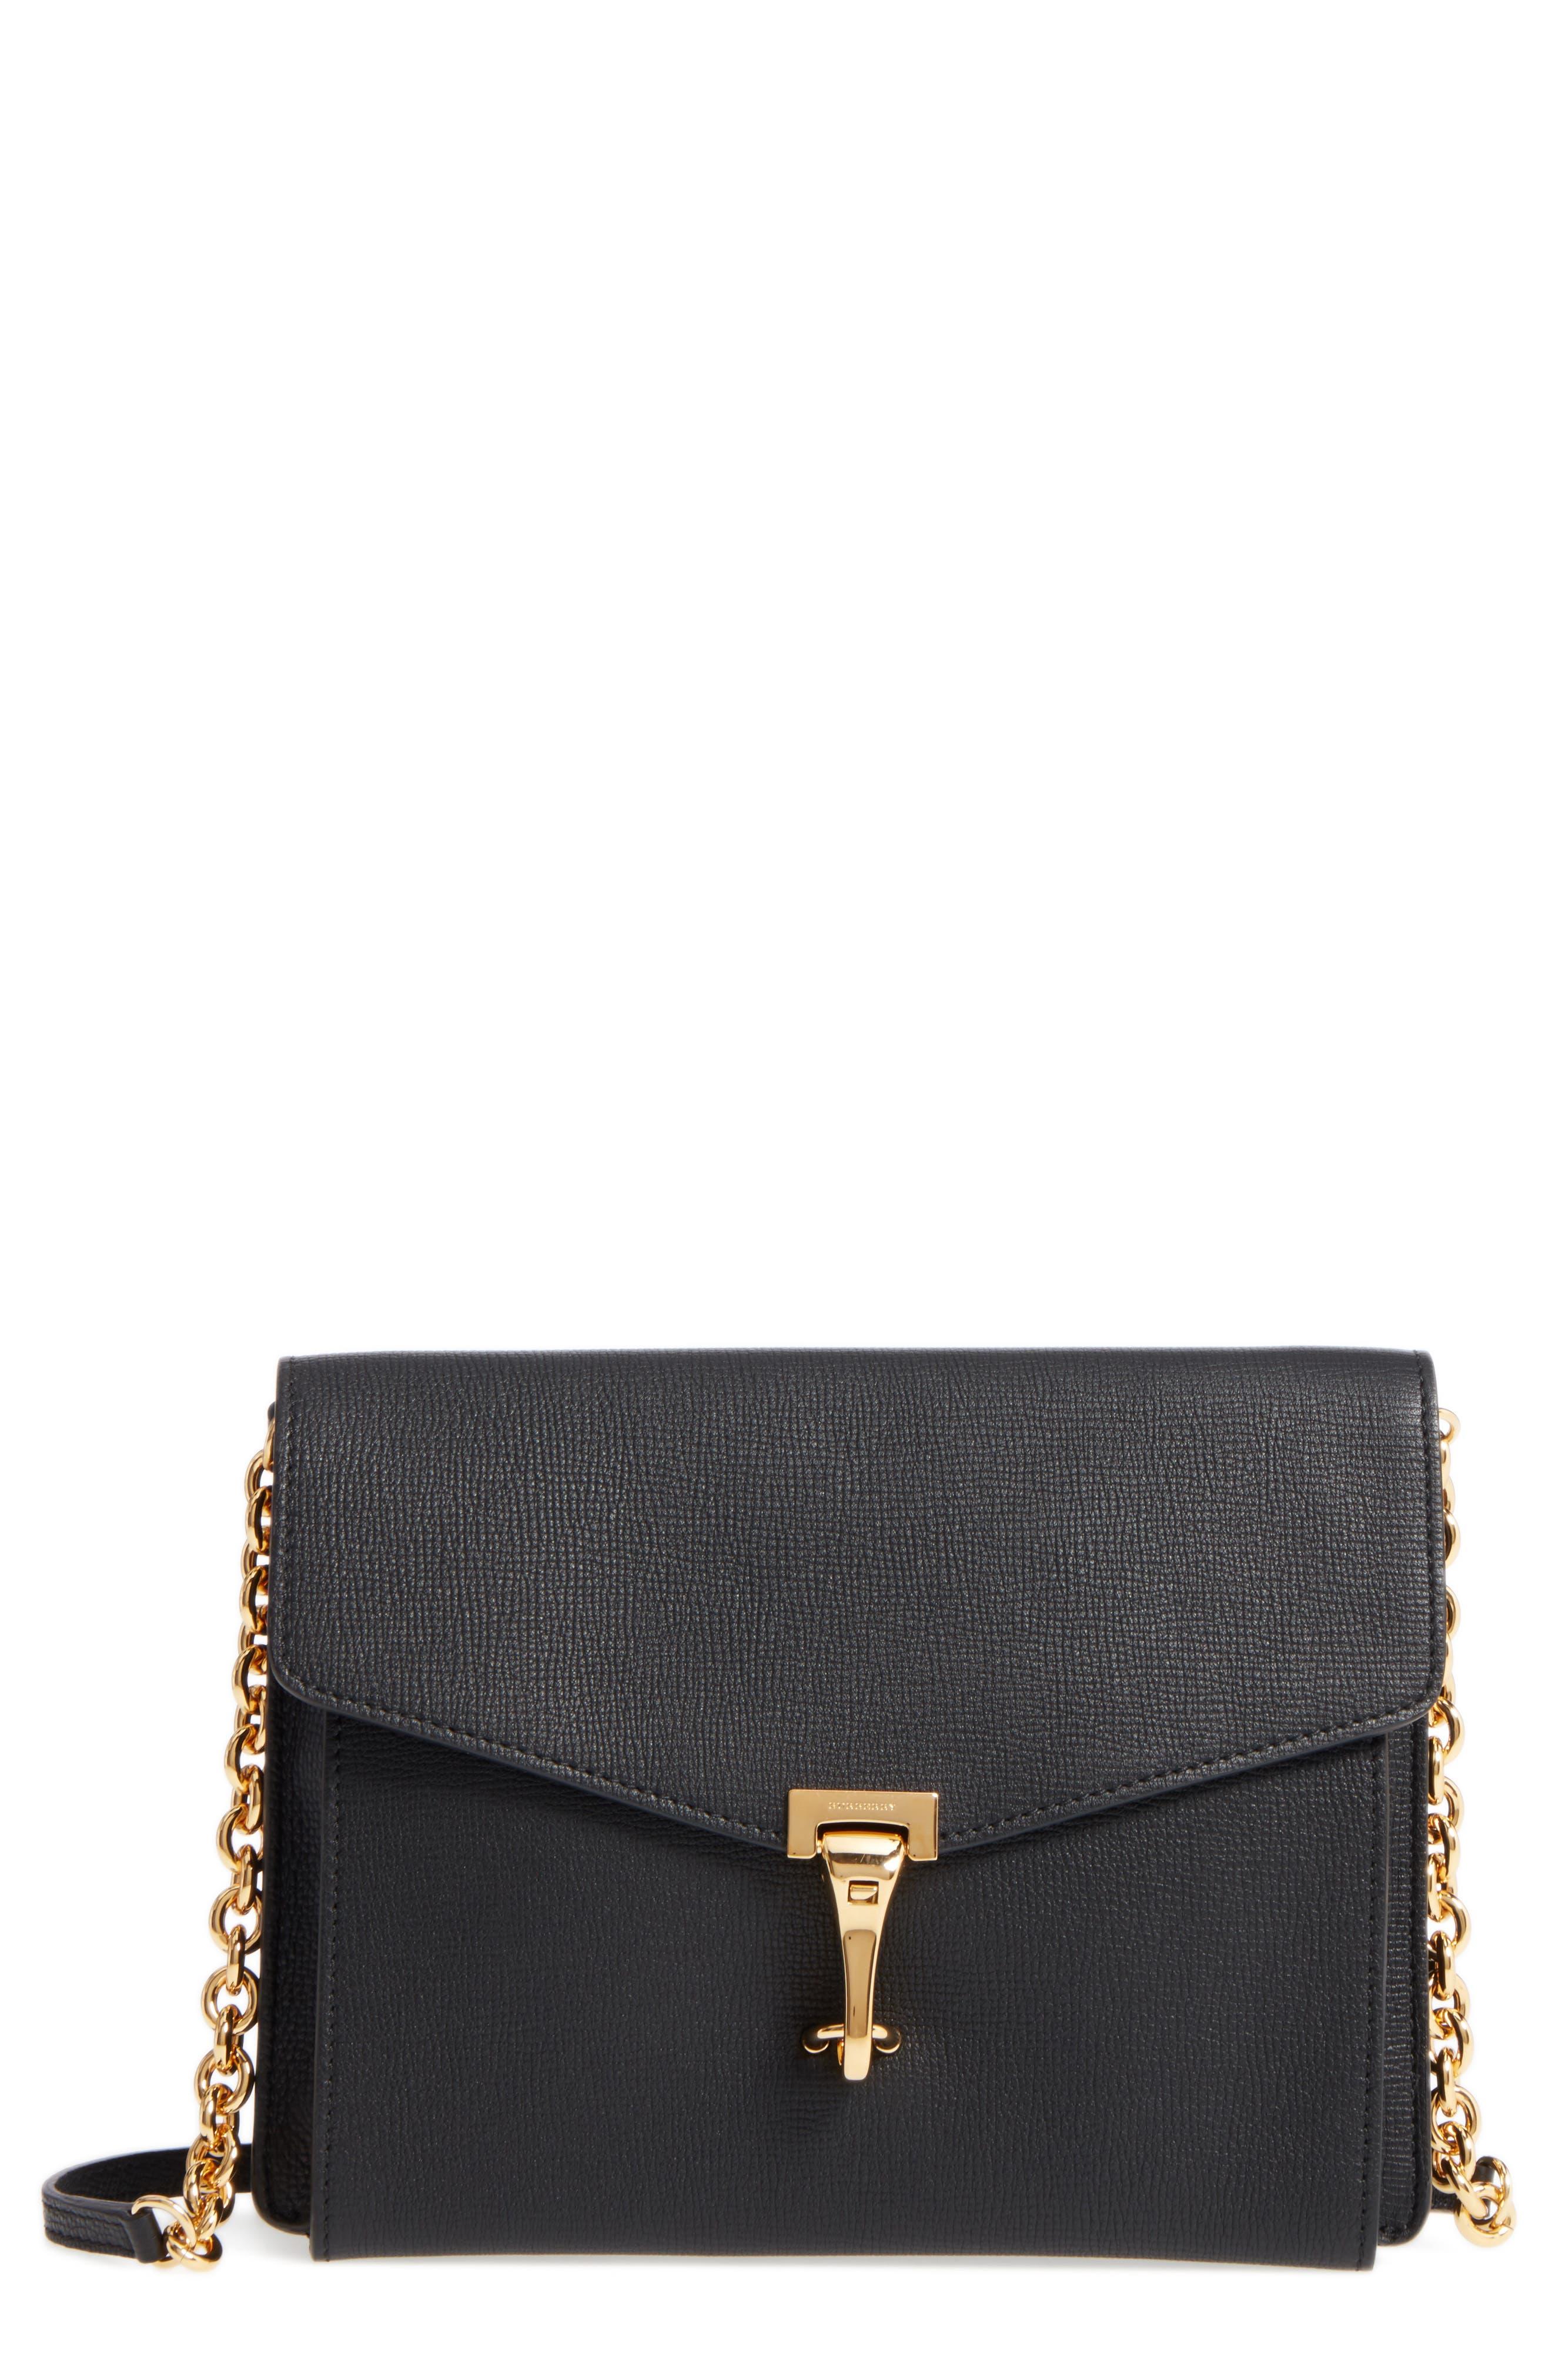 Macken Leather Crossbody Bag,                         Main,                         color, 001